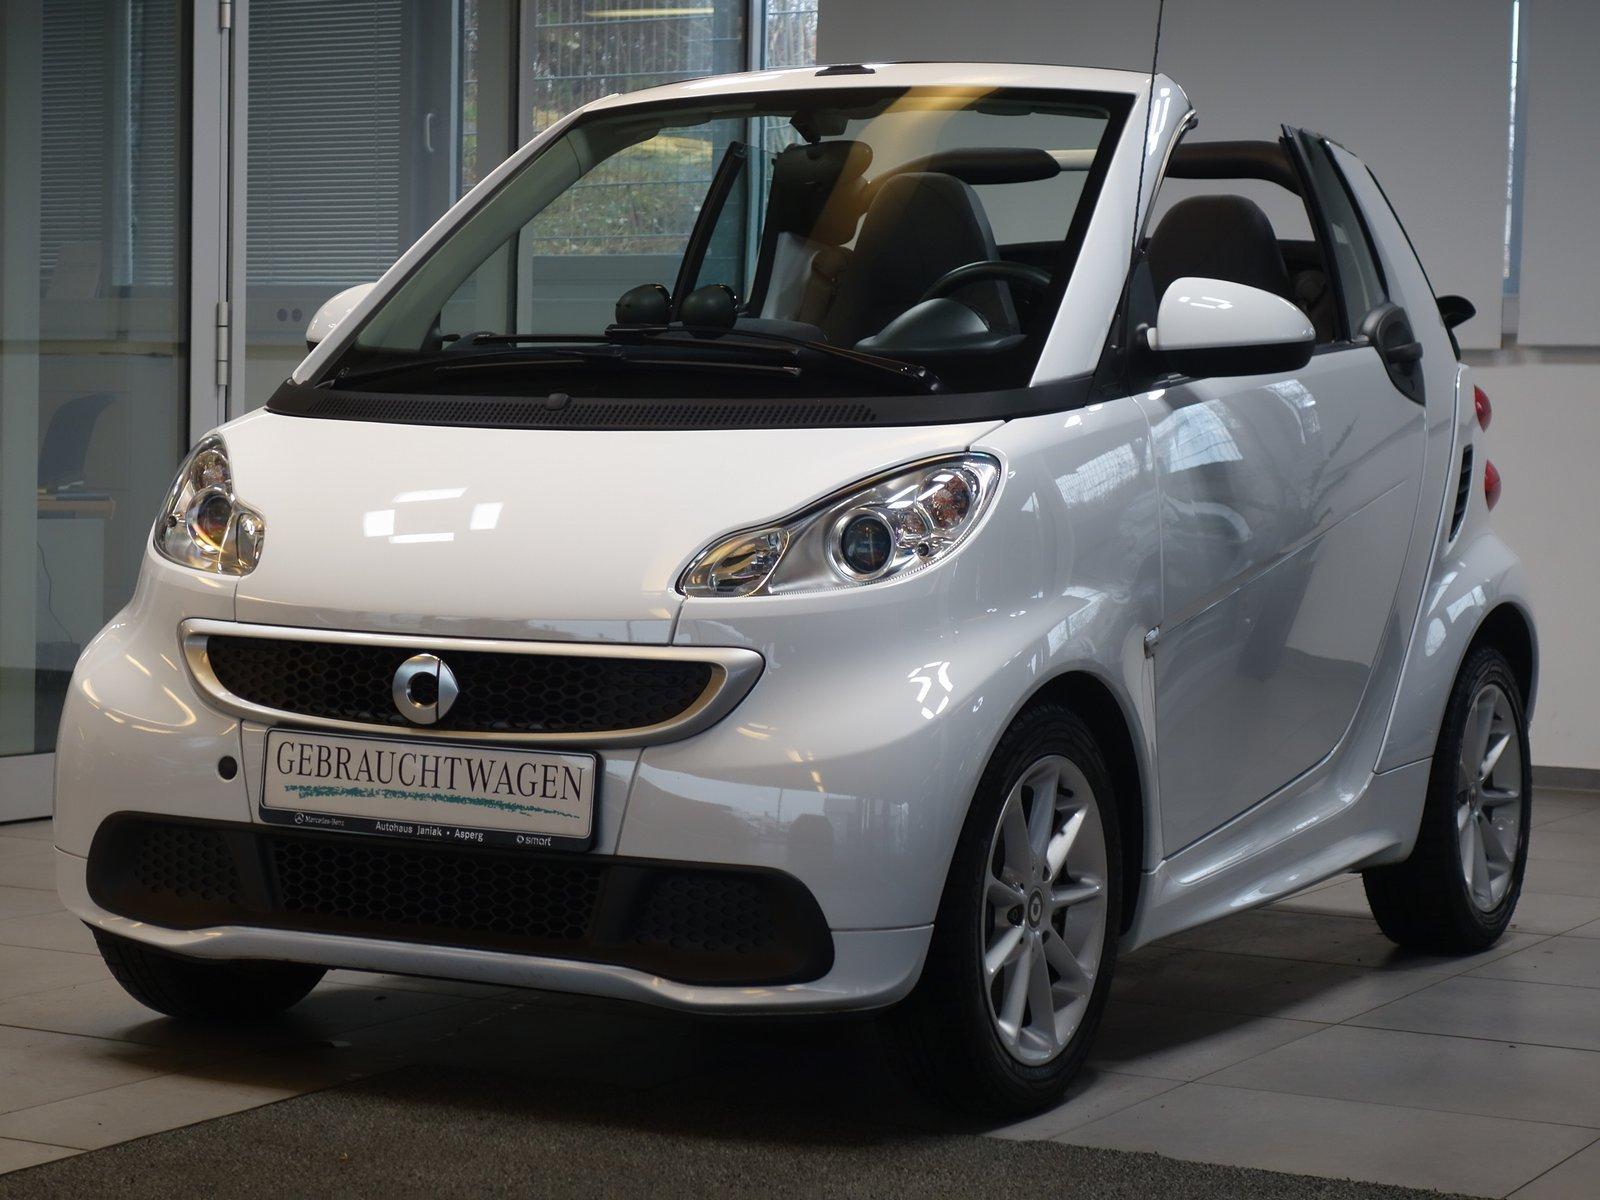 smart fortwo cabrio mhd Passion Servo Klima ISOFIX, Jahr 2013, Benzin